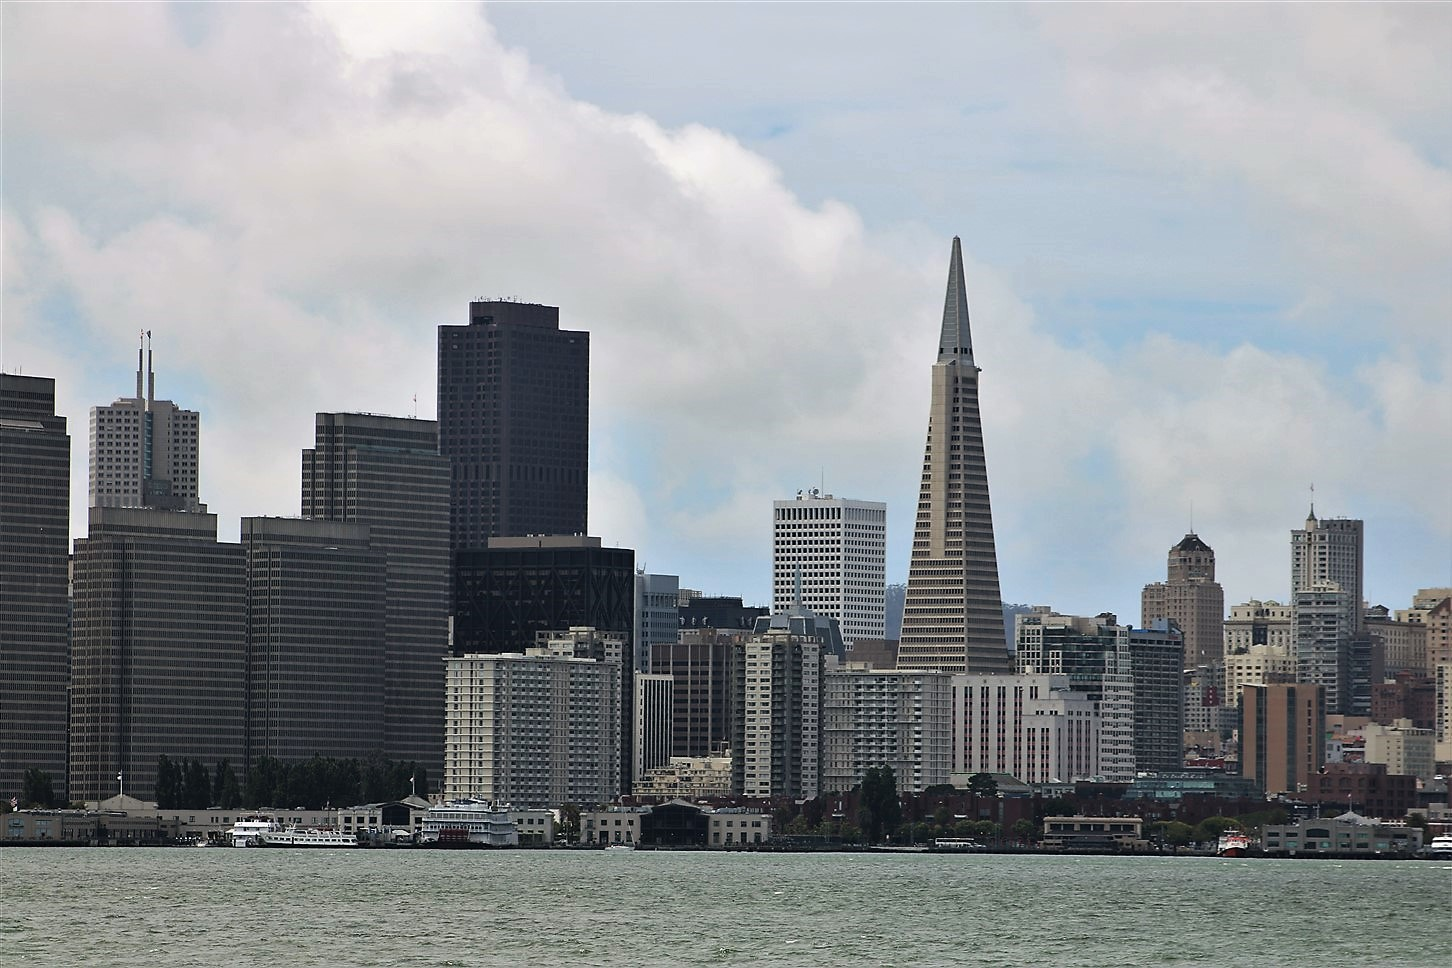 2016 05 21 142 San Francisco.jpg